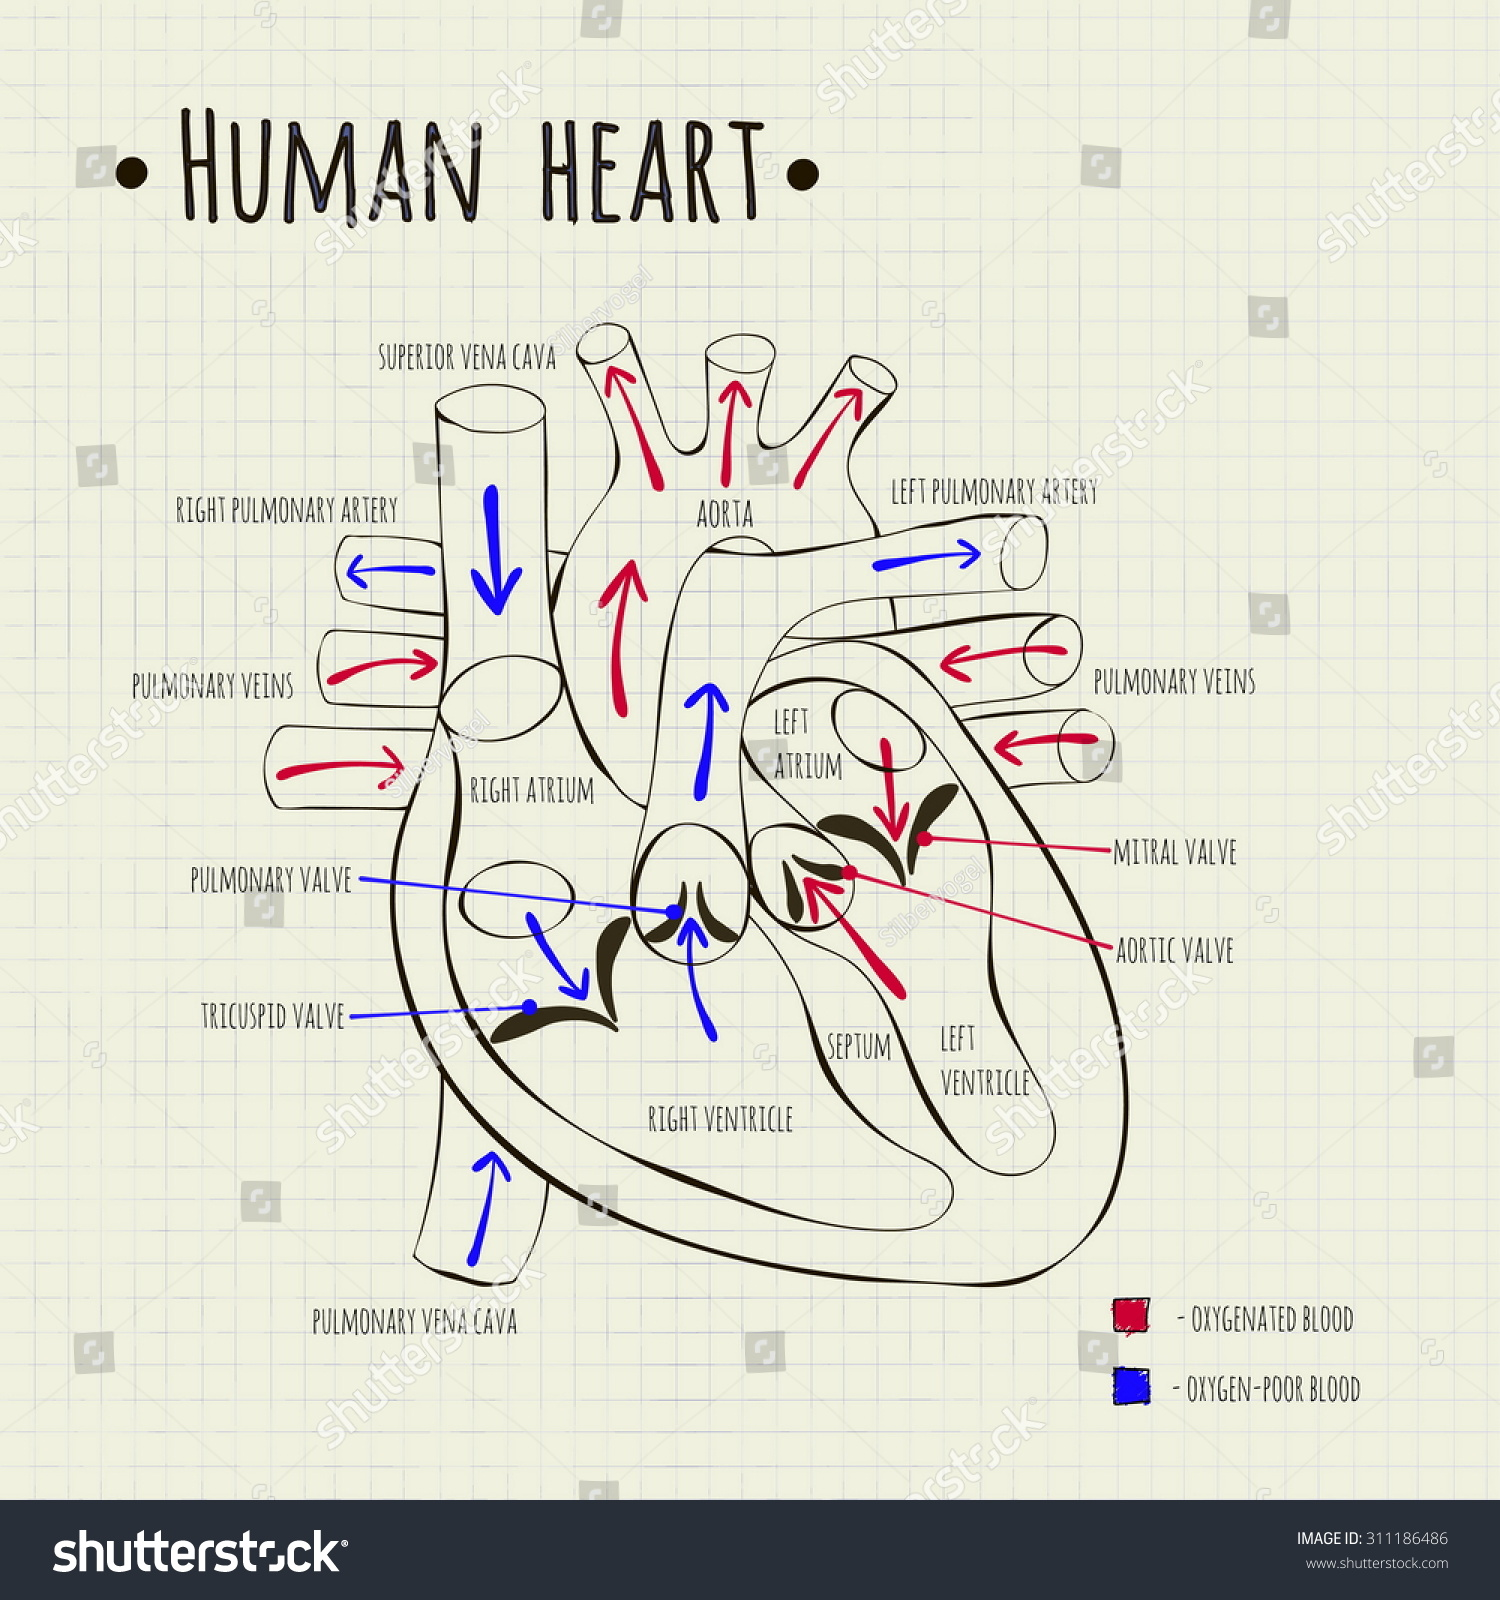 Vector Drawing Of A Human Heart Diagram - 311186486 ...